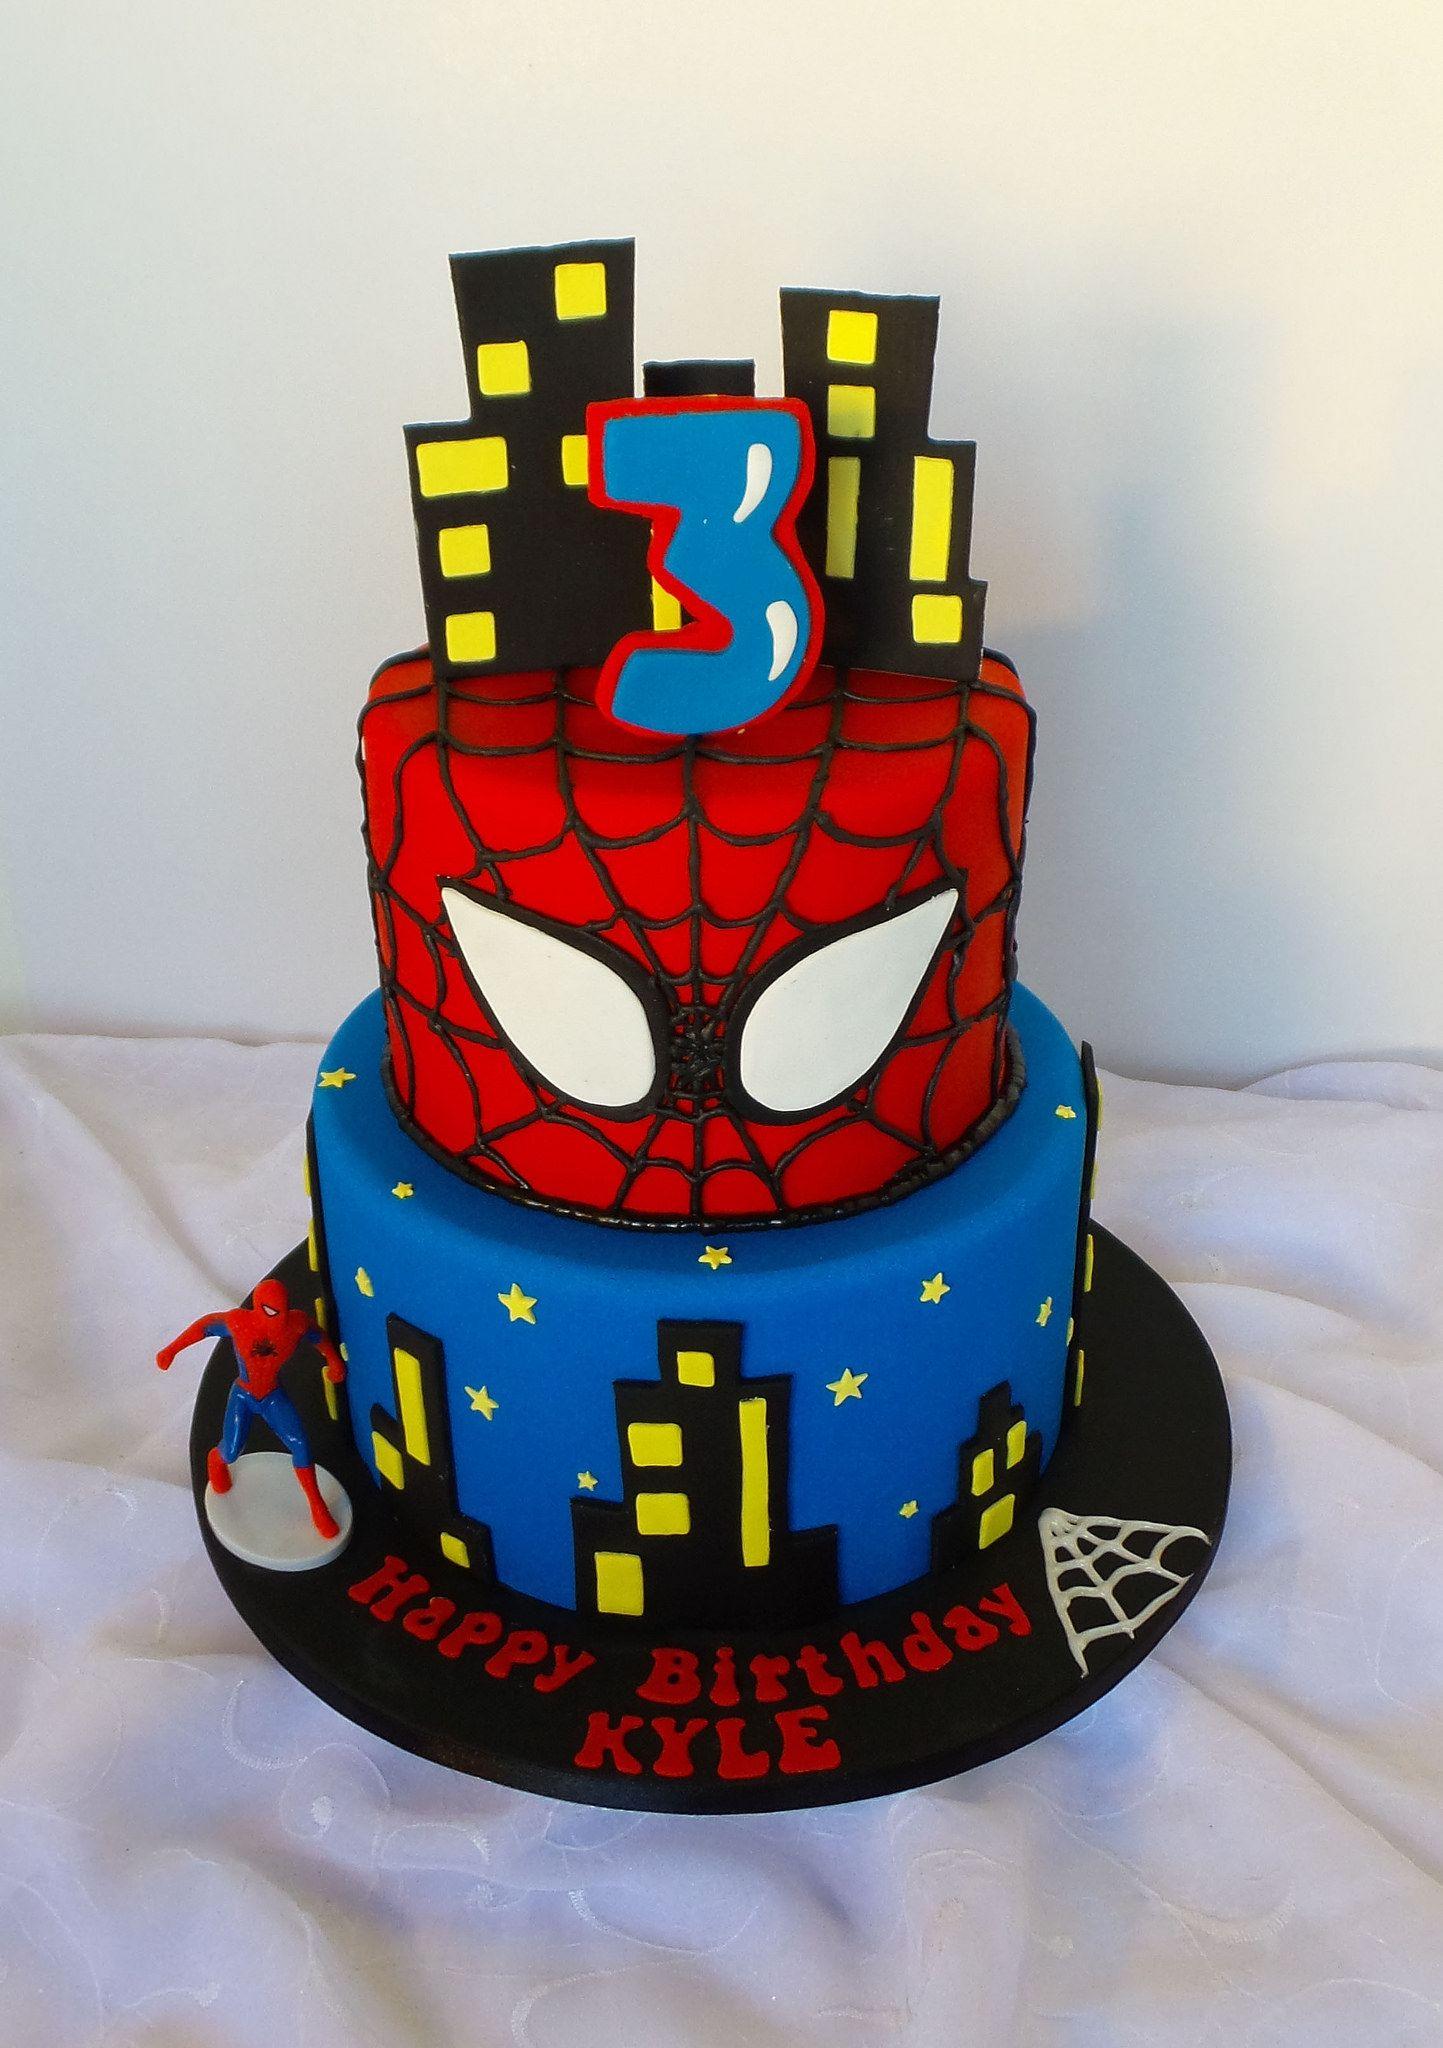 Outstanding Spider Man Cakes Birthday Cakes Anniversary Cakes Wedding Cakes Funny Birthday Cards Online Barepcheapnameinfo